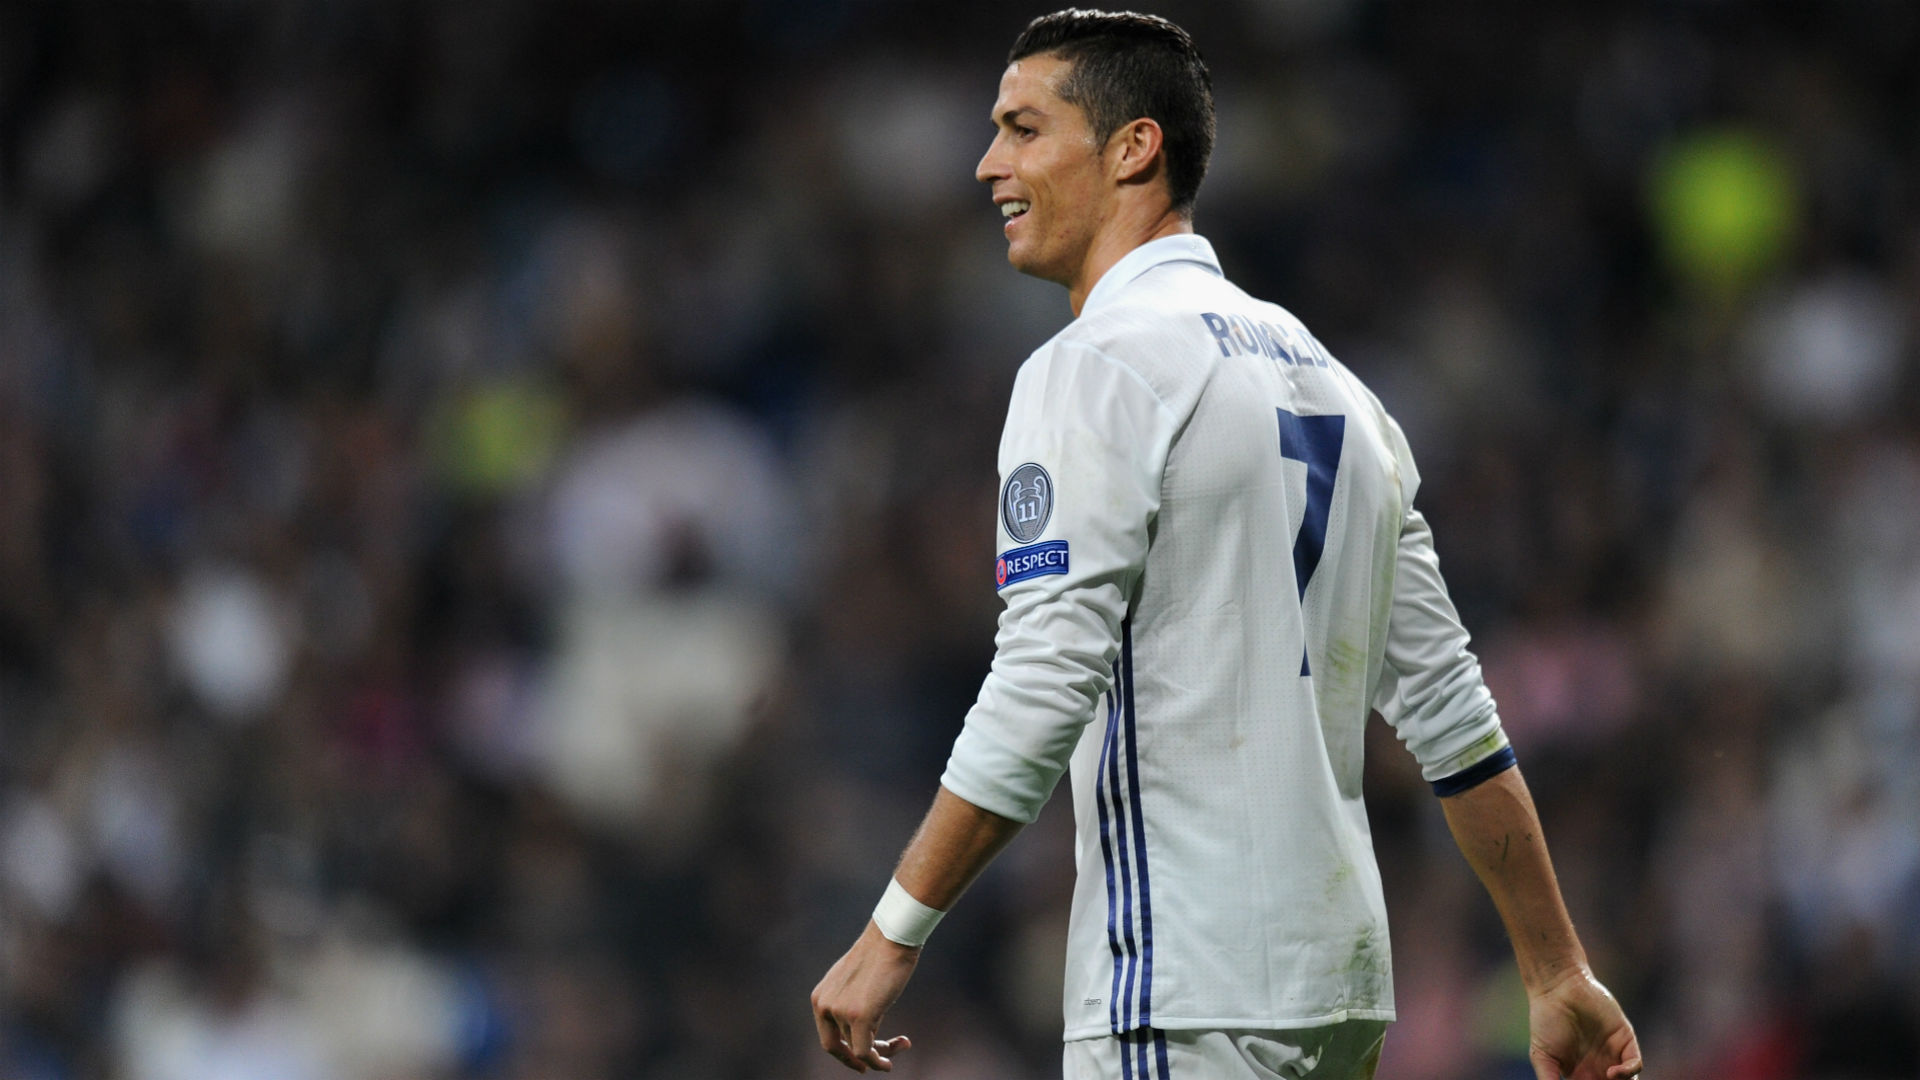 'We expect more from him' - Zidane on Ronaldo's goal struggles against Legia